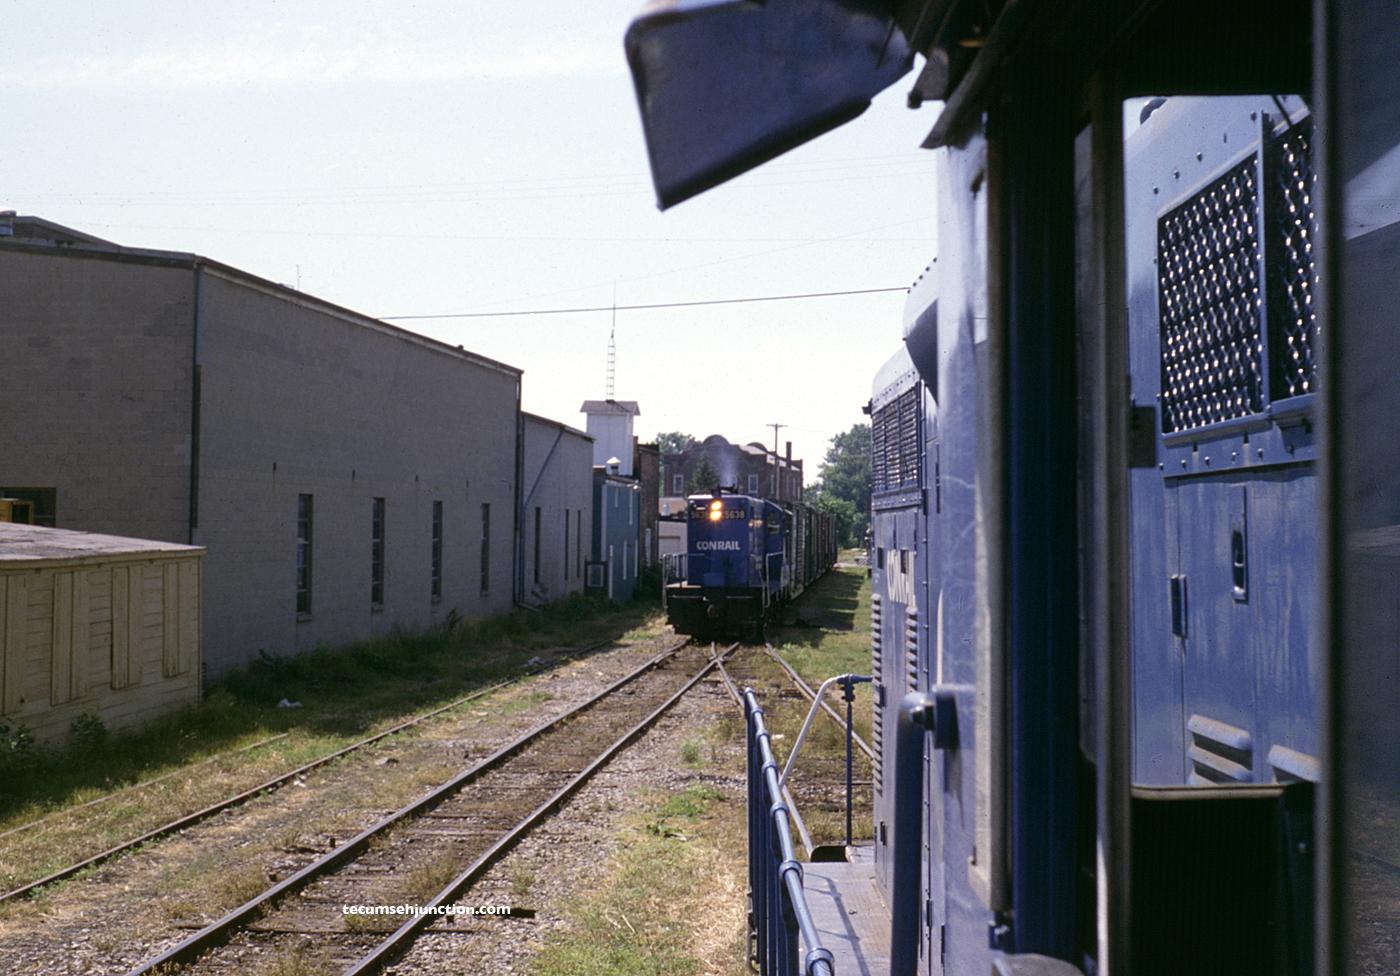 Conrail trains at Blissfield, MI on 26 June 1979